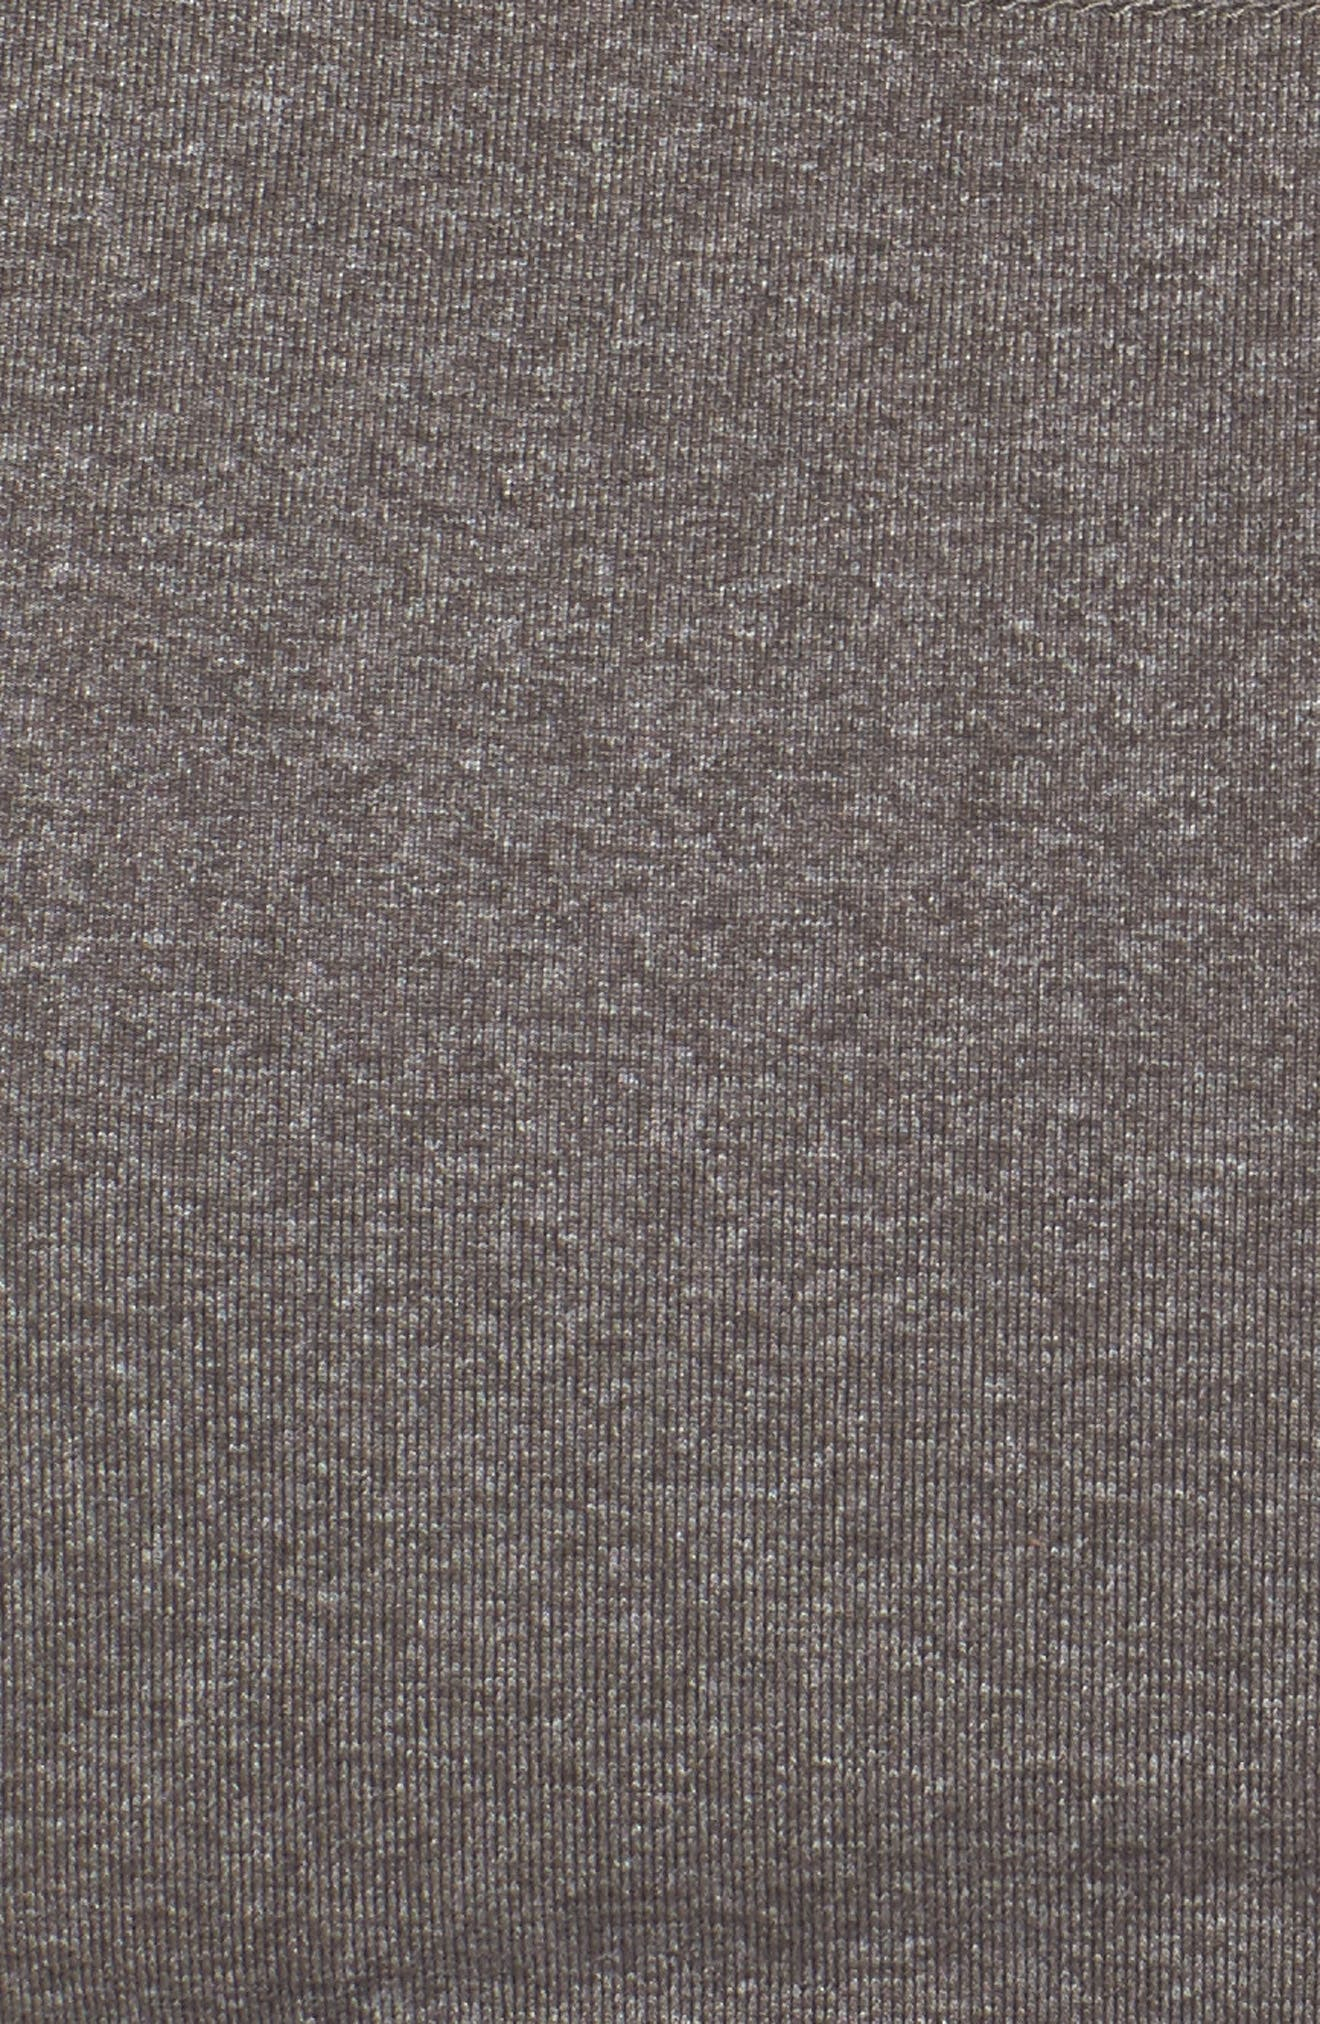 FP Movement Vision Strappy Bra,                             Alternate thumbnail 6, color,                             Light Grey